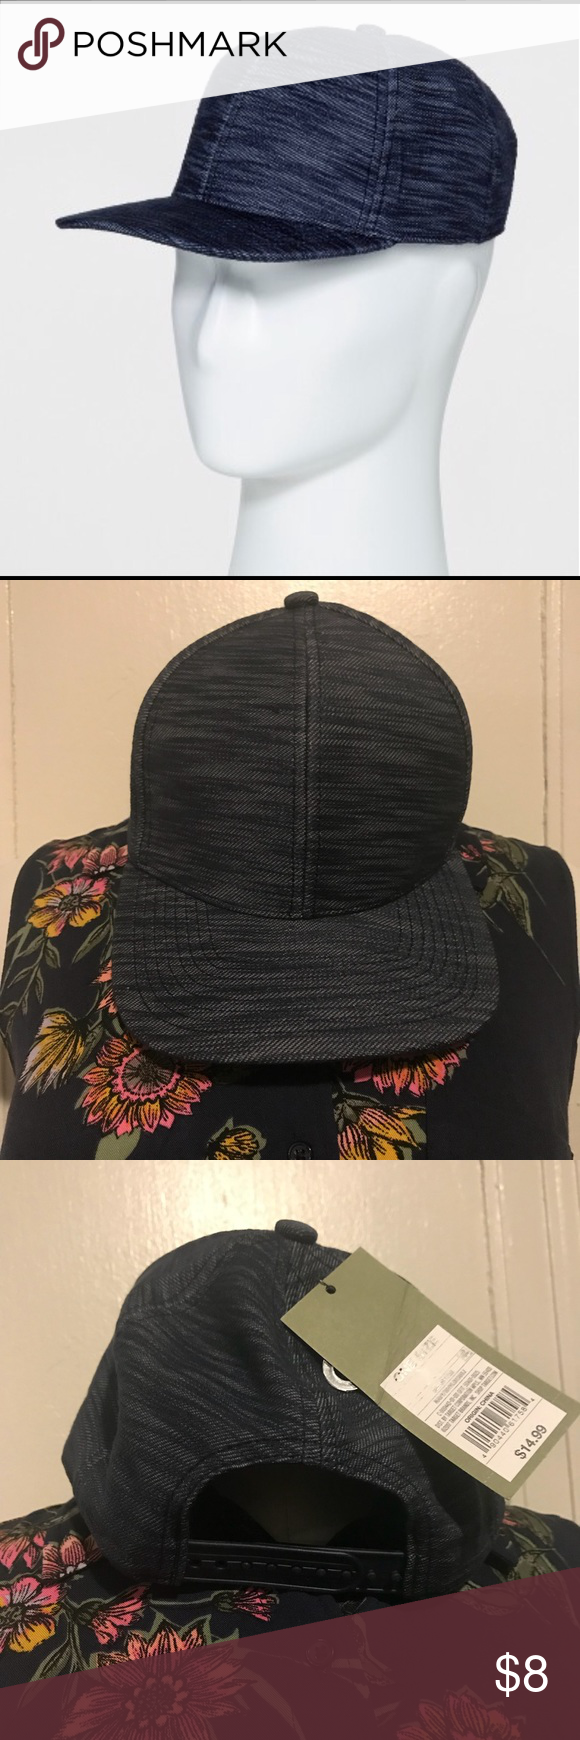 891fd92b4e6a0 Men s striped curve brim baseball hat Men s striped curve brim baseball hat  Navy one size Goodfellow